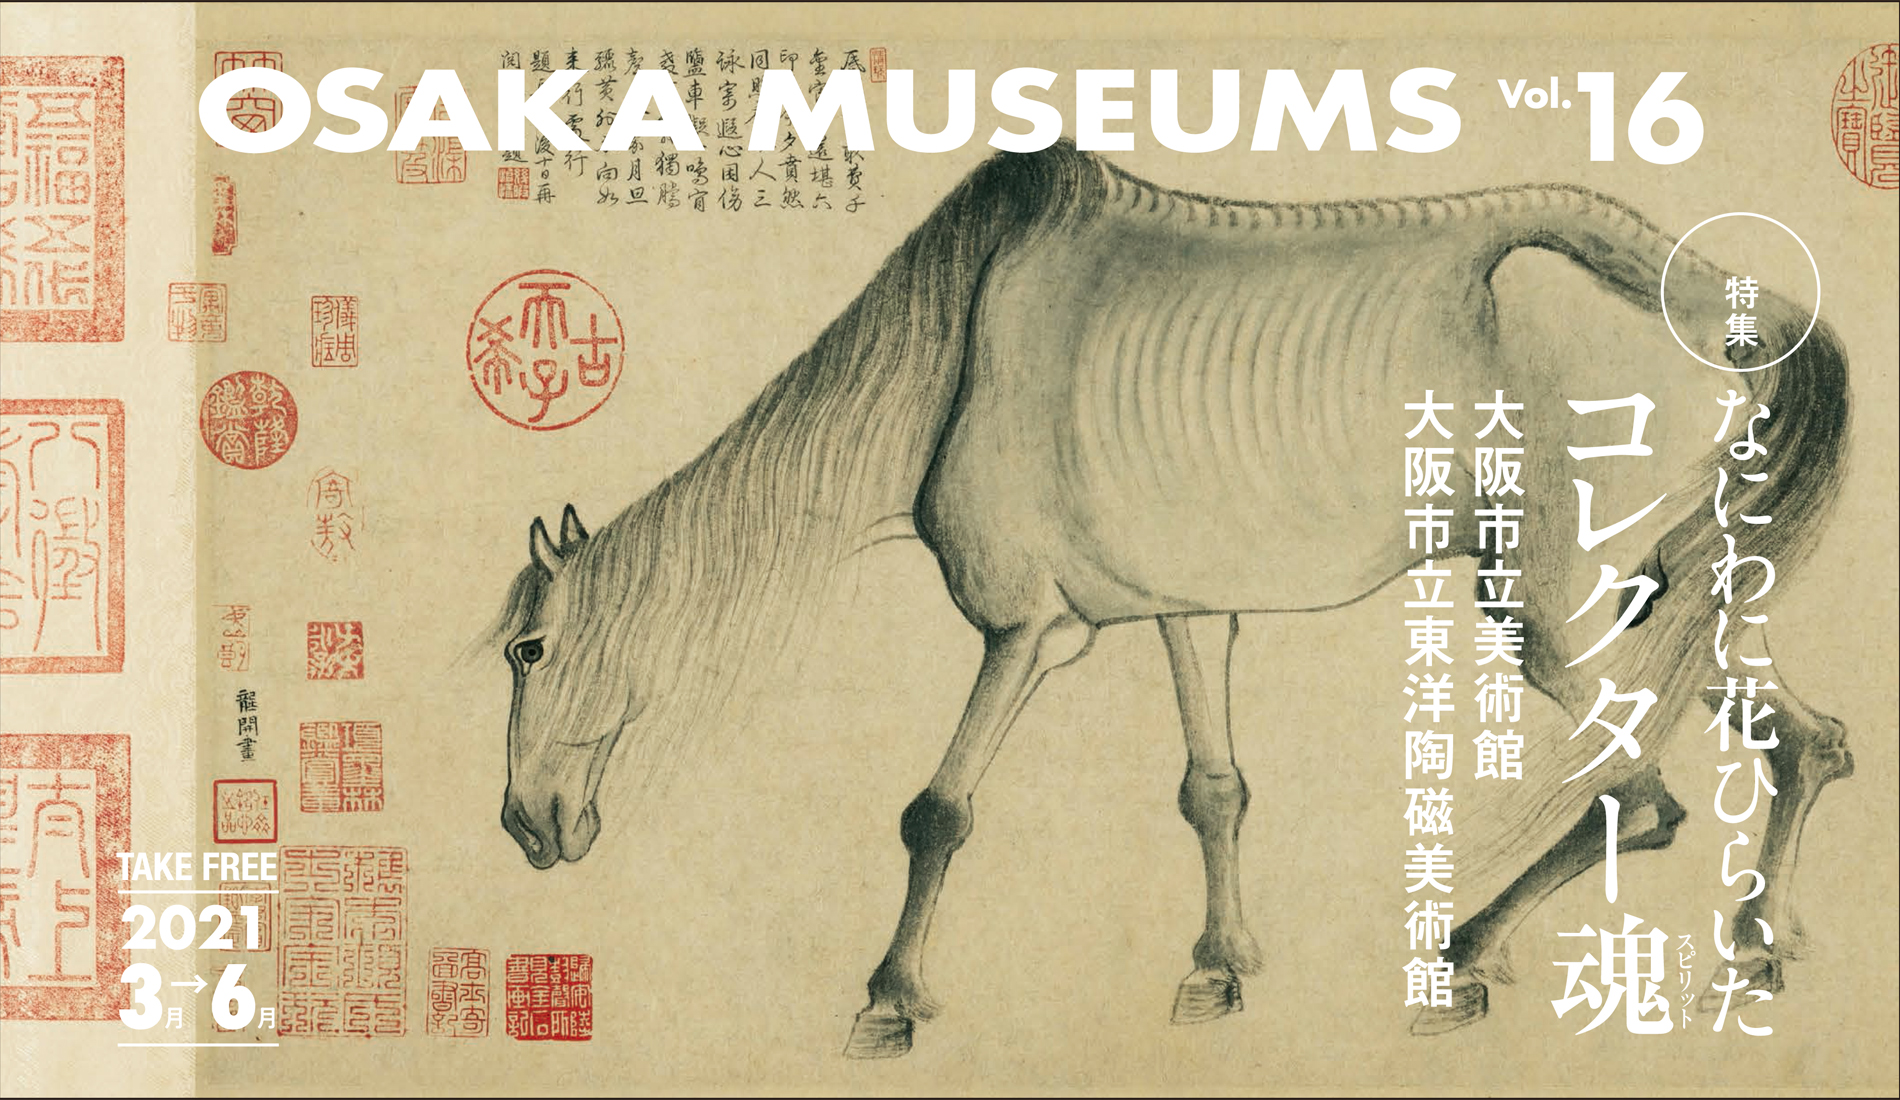 広報誌,OsakaMuseums,大阪市立美術館,大阪市立東洋陶磁美術館,コレクター